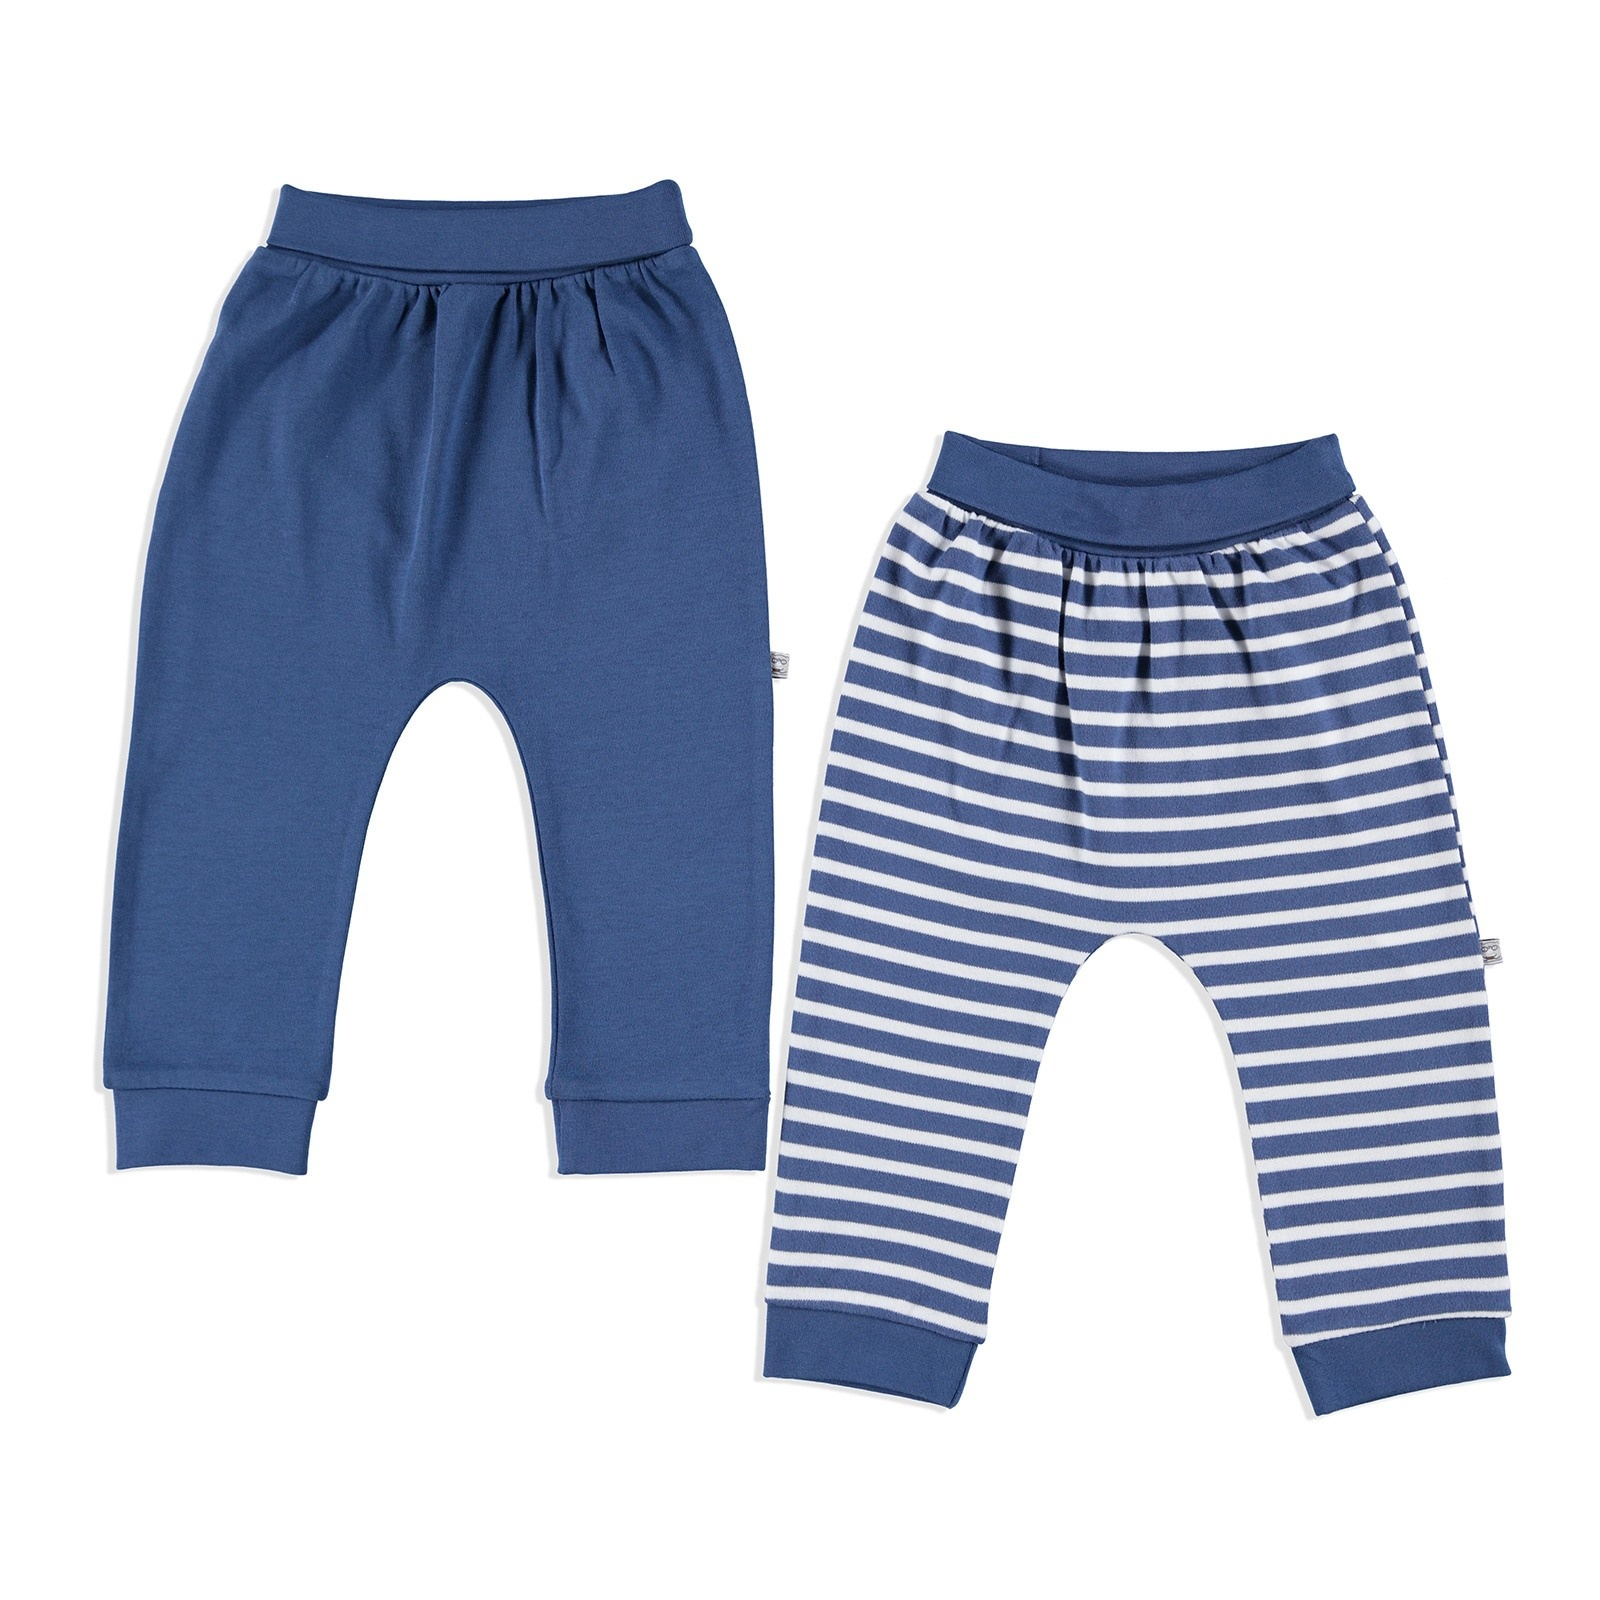 Ebebek Carmin Baby Camping Interlock Footless Pants 2 Pcs